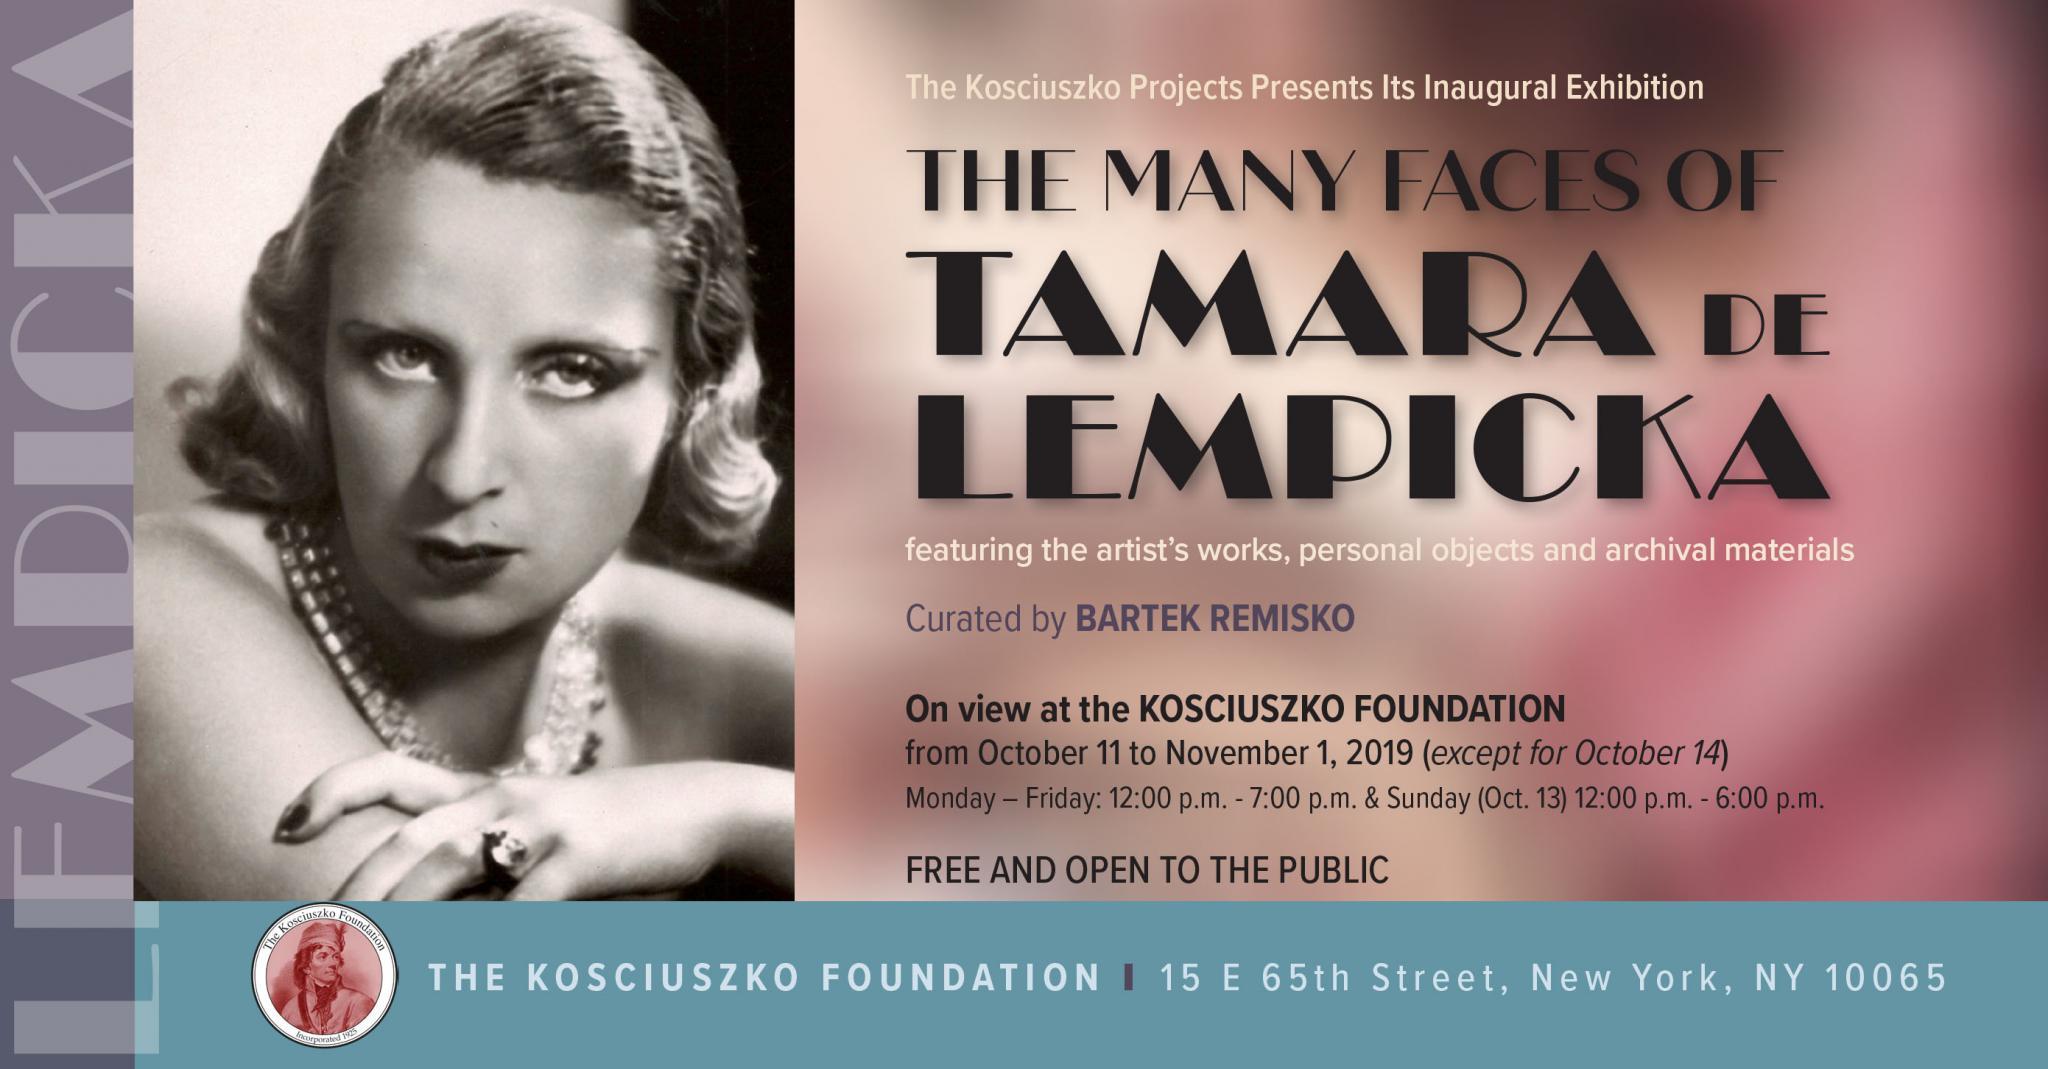 Kosciuszko Projects Exhibition in New York and The Many Faces of Tamara de Lempicka